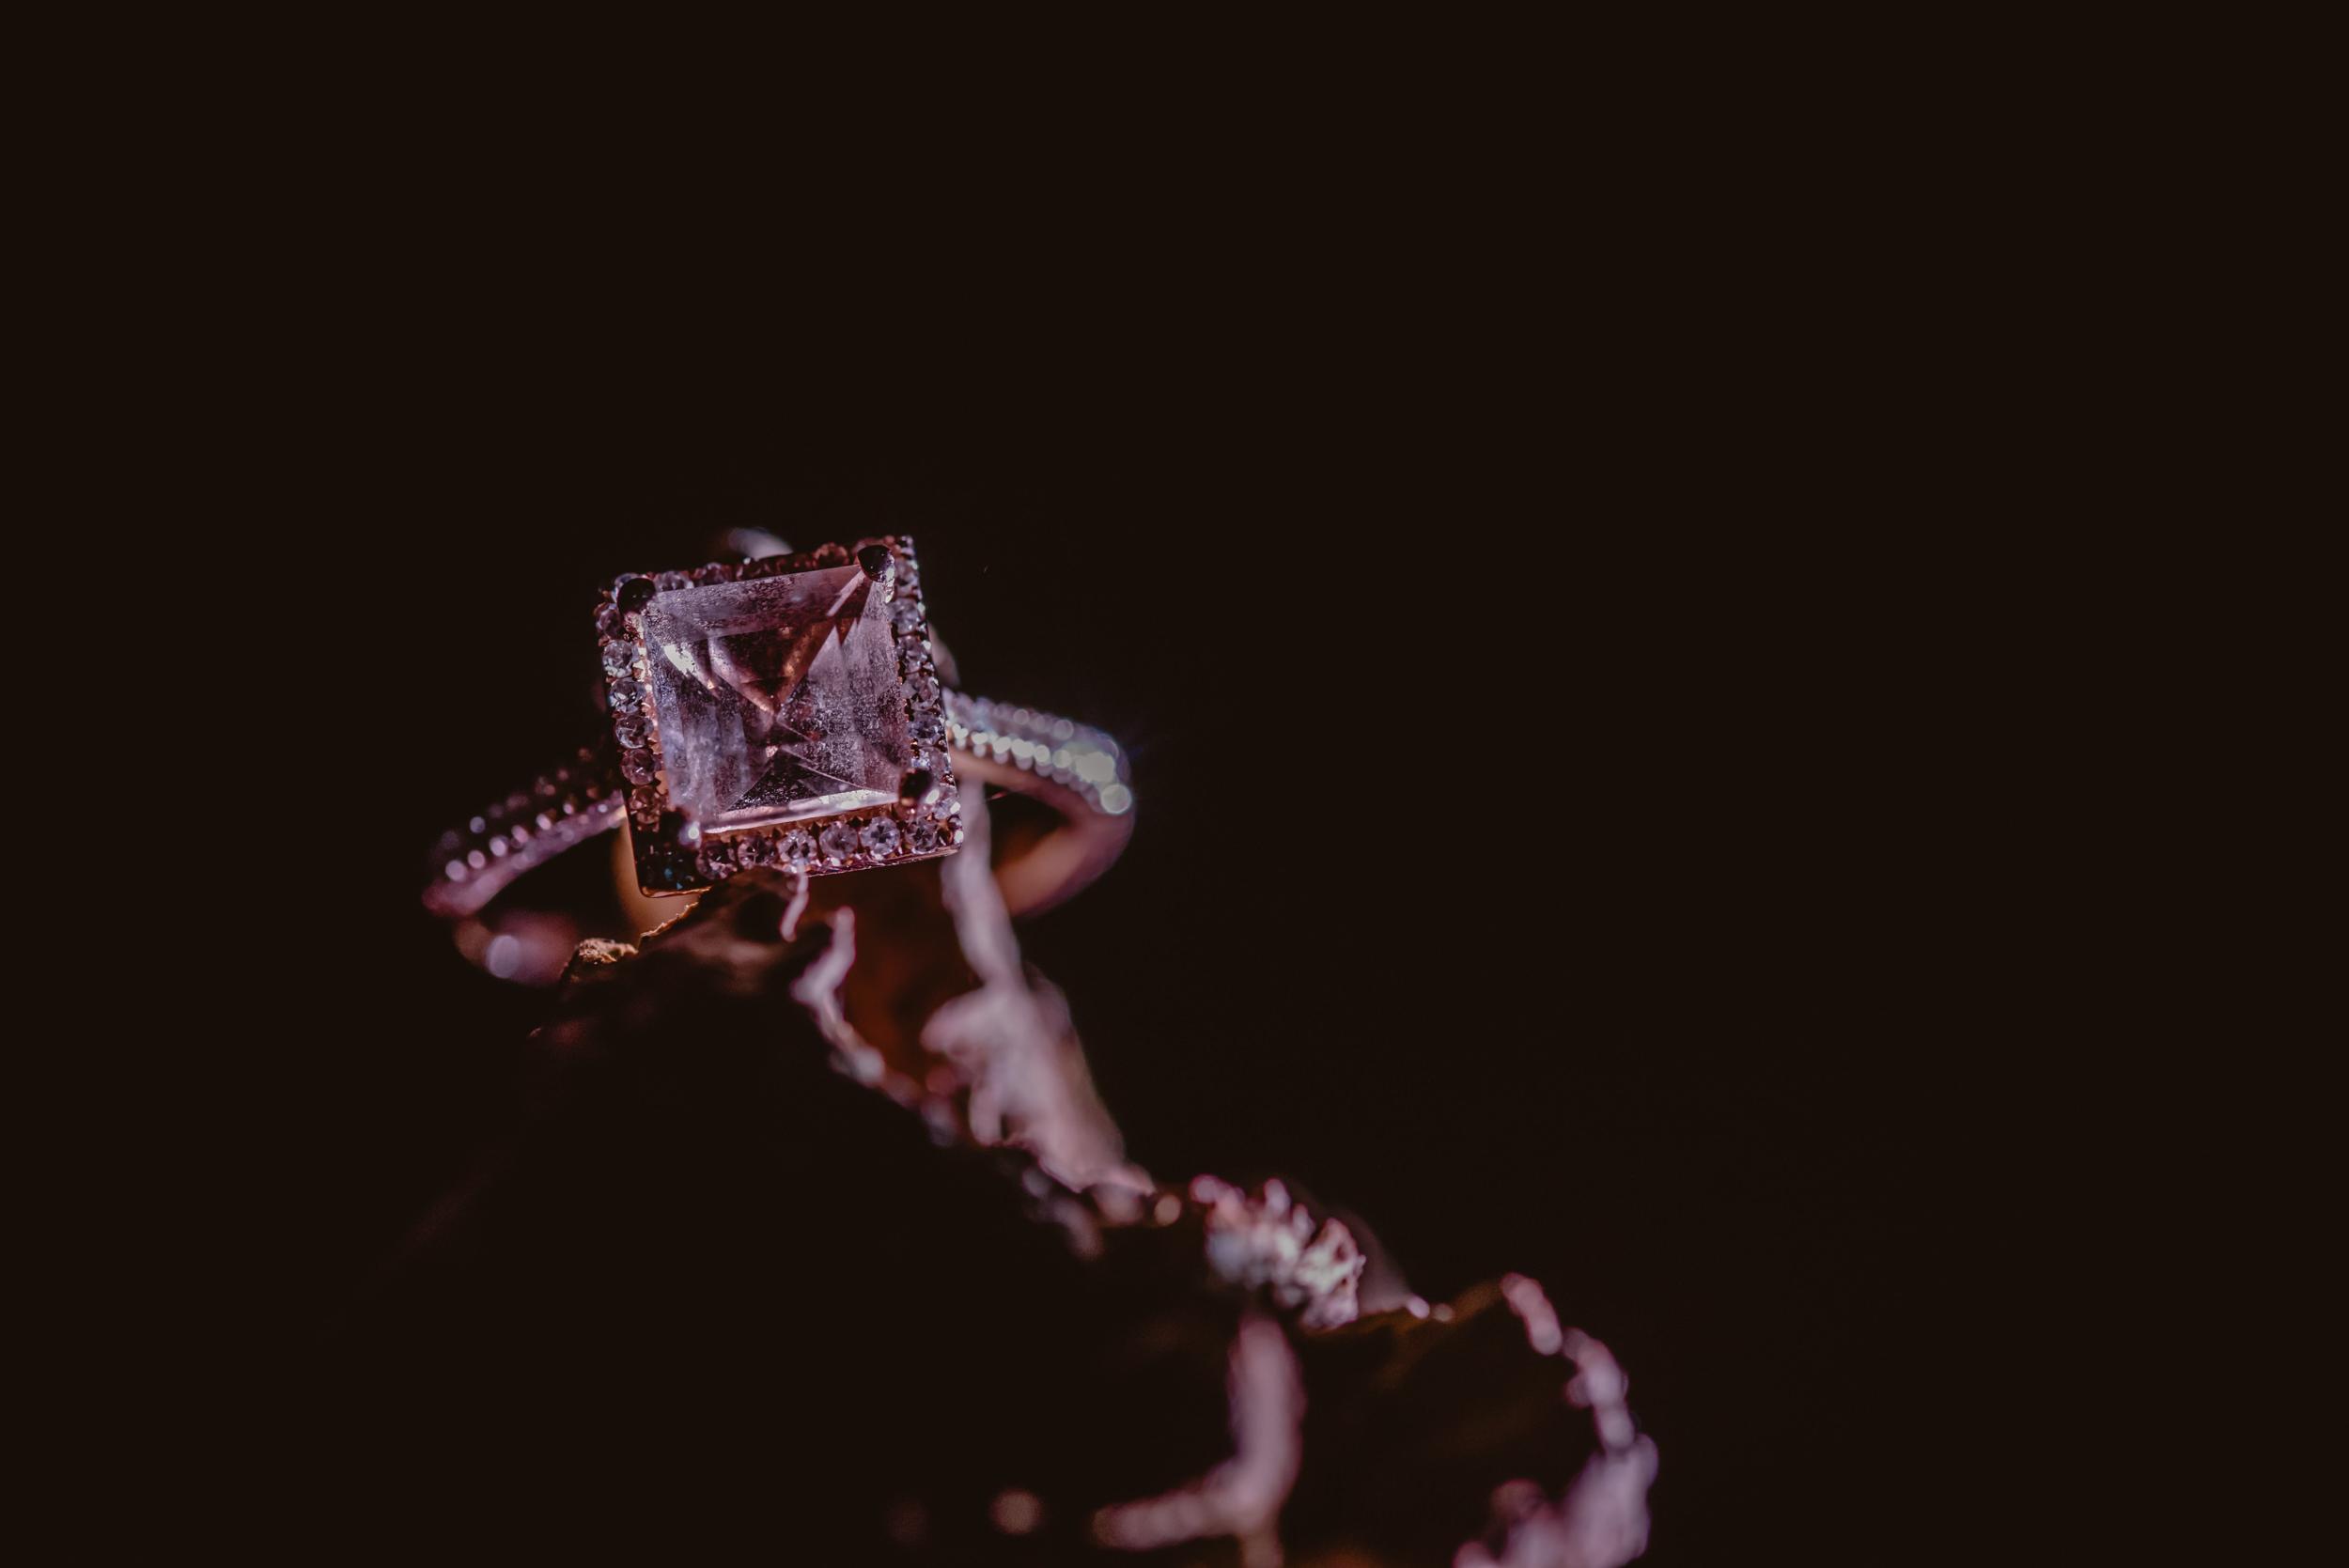 Emma-and-Jon-engagement-session-Fair-Oak-Manu-Mendoza-Wedding-Photography-081.jpg